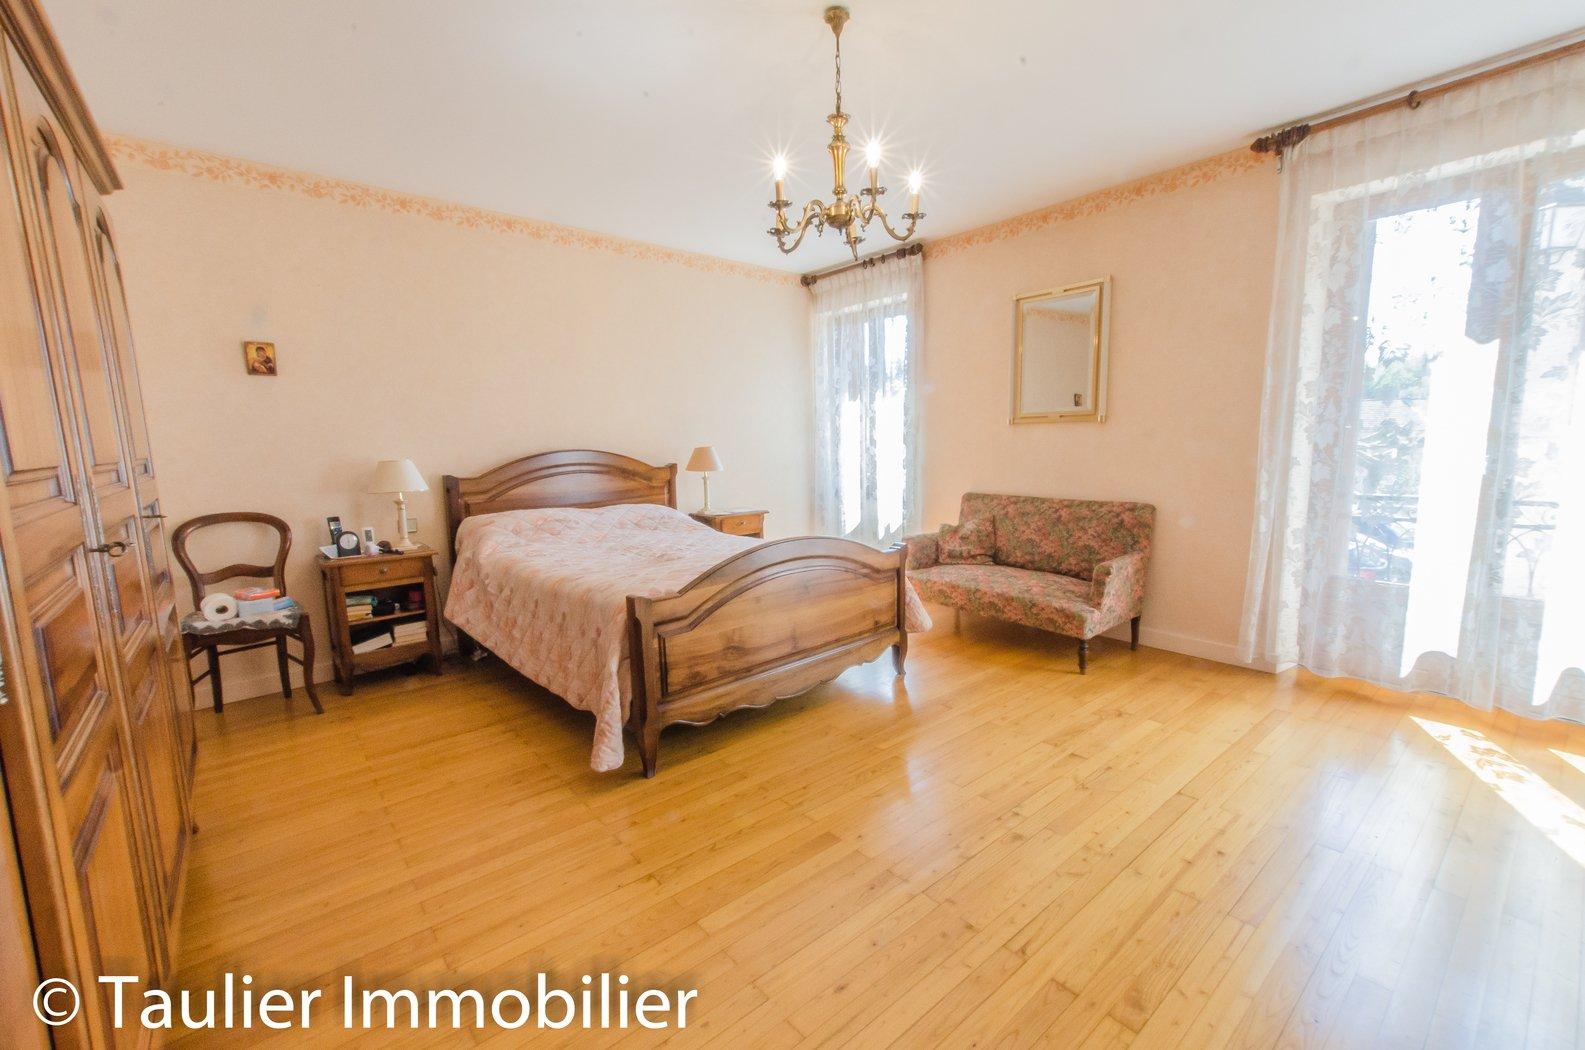 Grande chambre avec parquet,